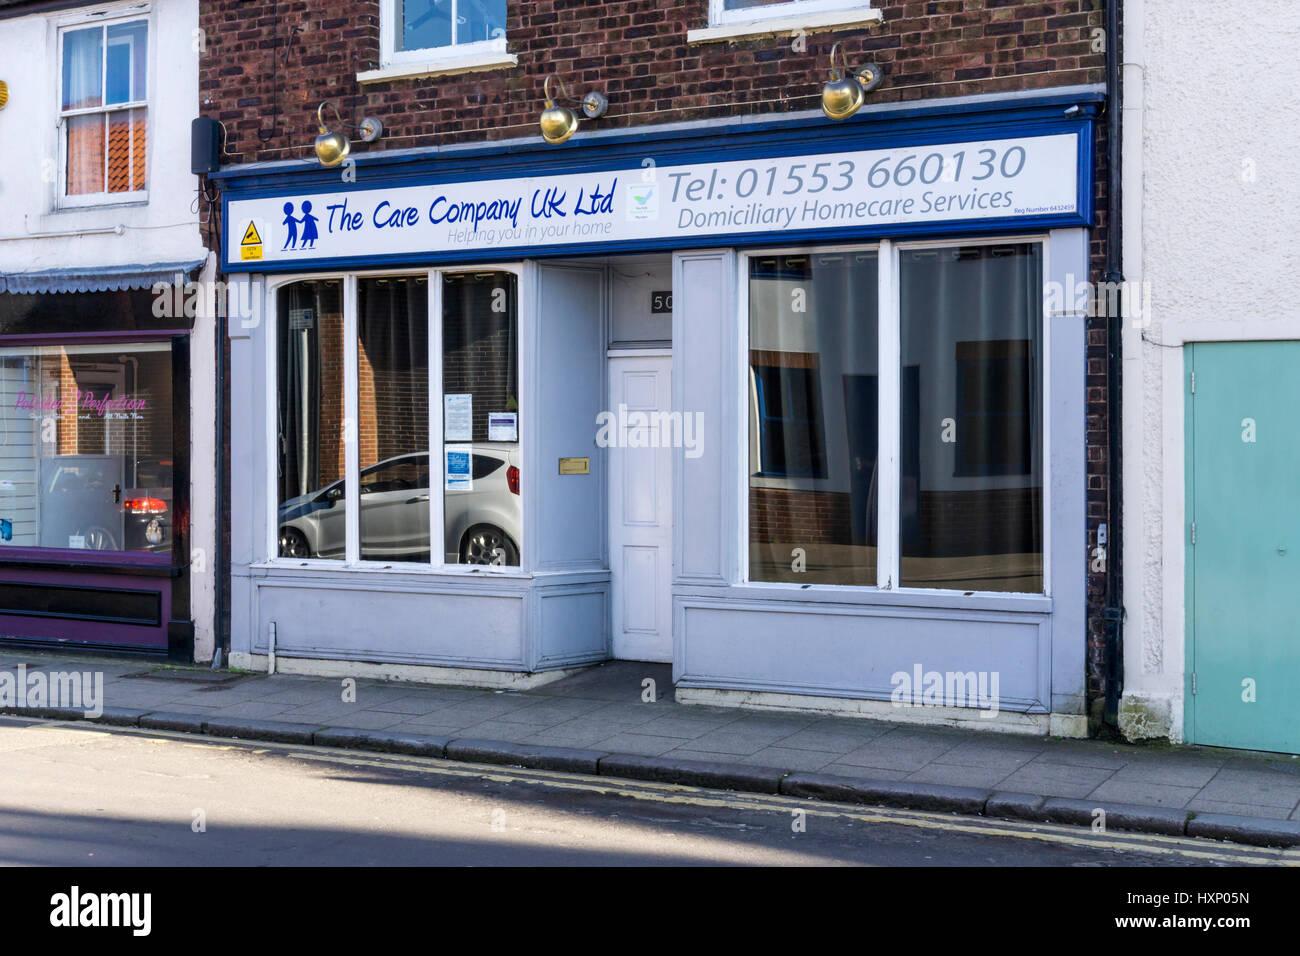 The premises of The Care Company UK Ltd in Norfolk Street, King's Lynn. - Stock Image